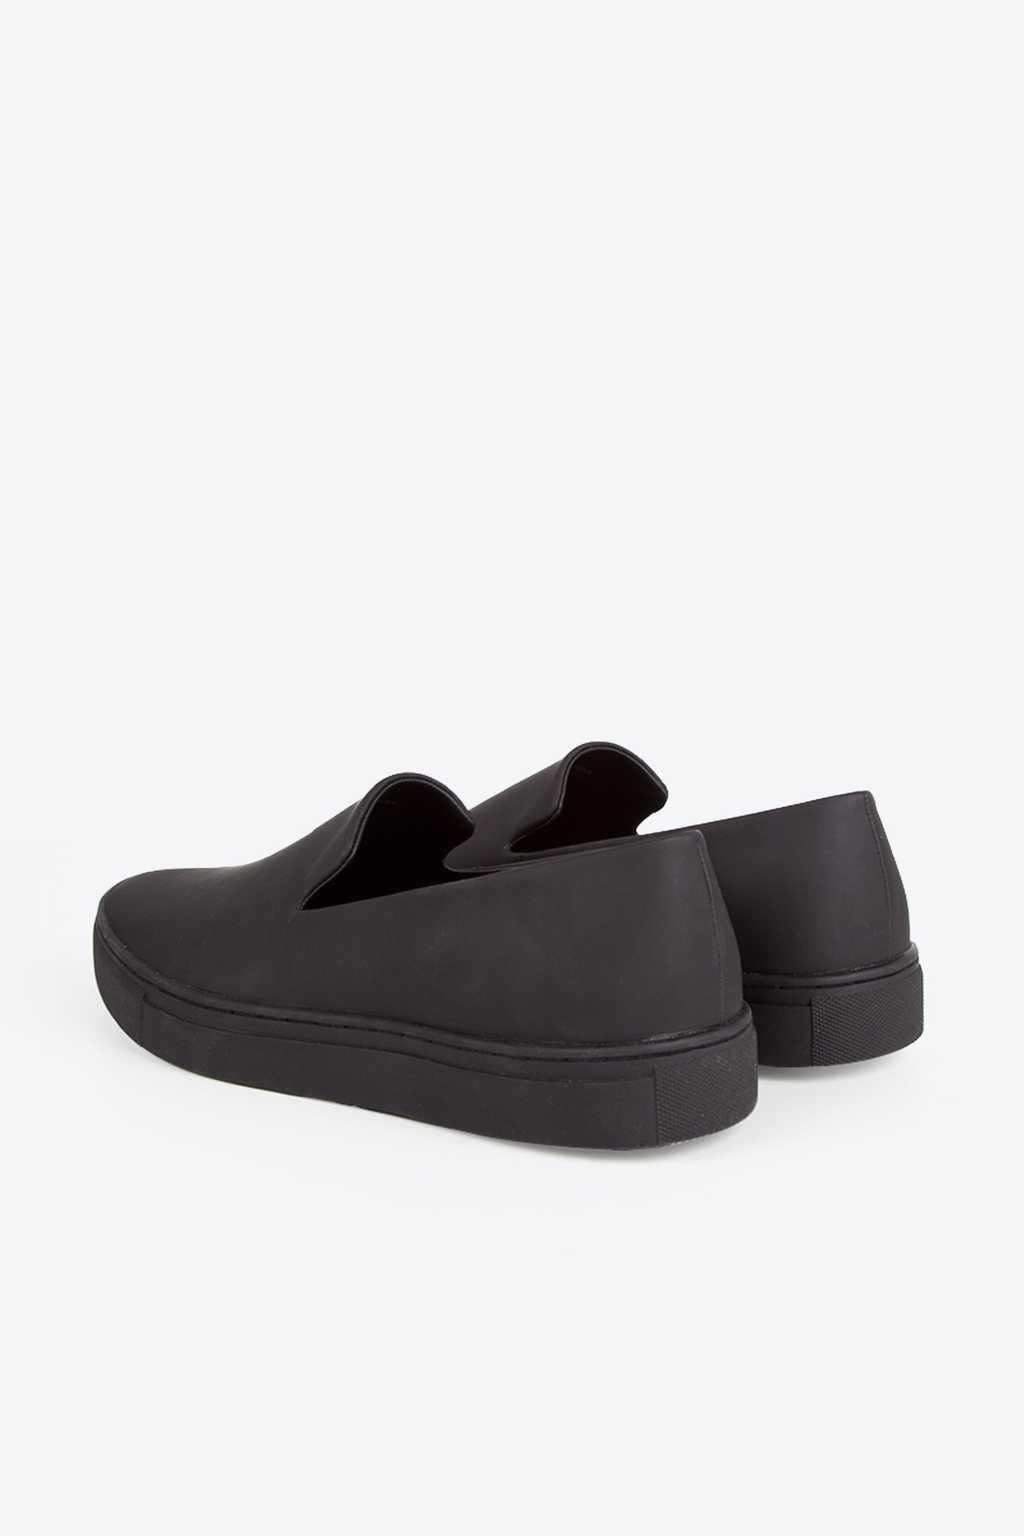 Slip On 1259 Black 7